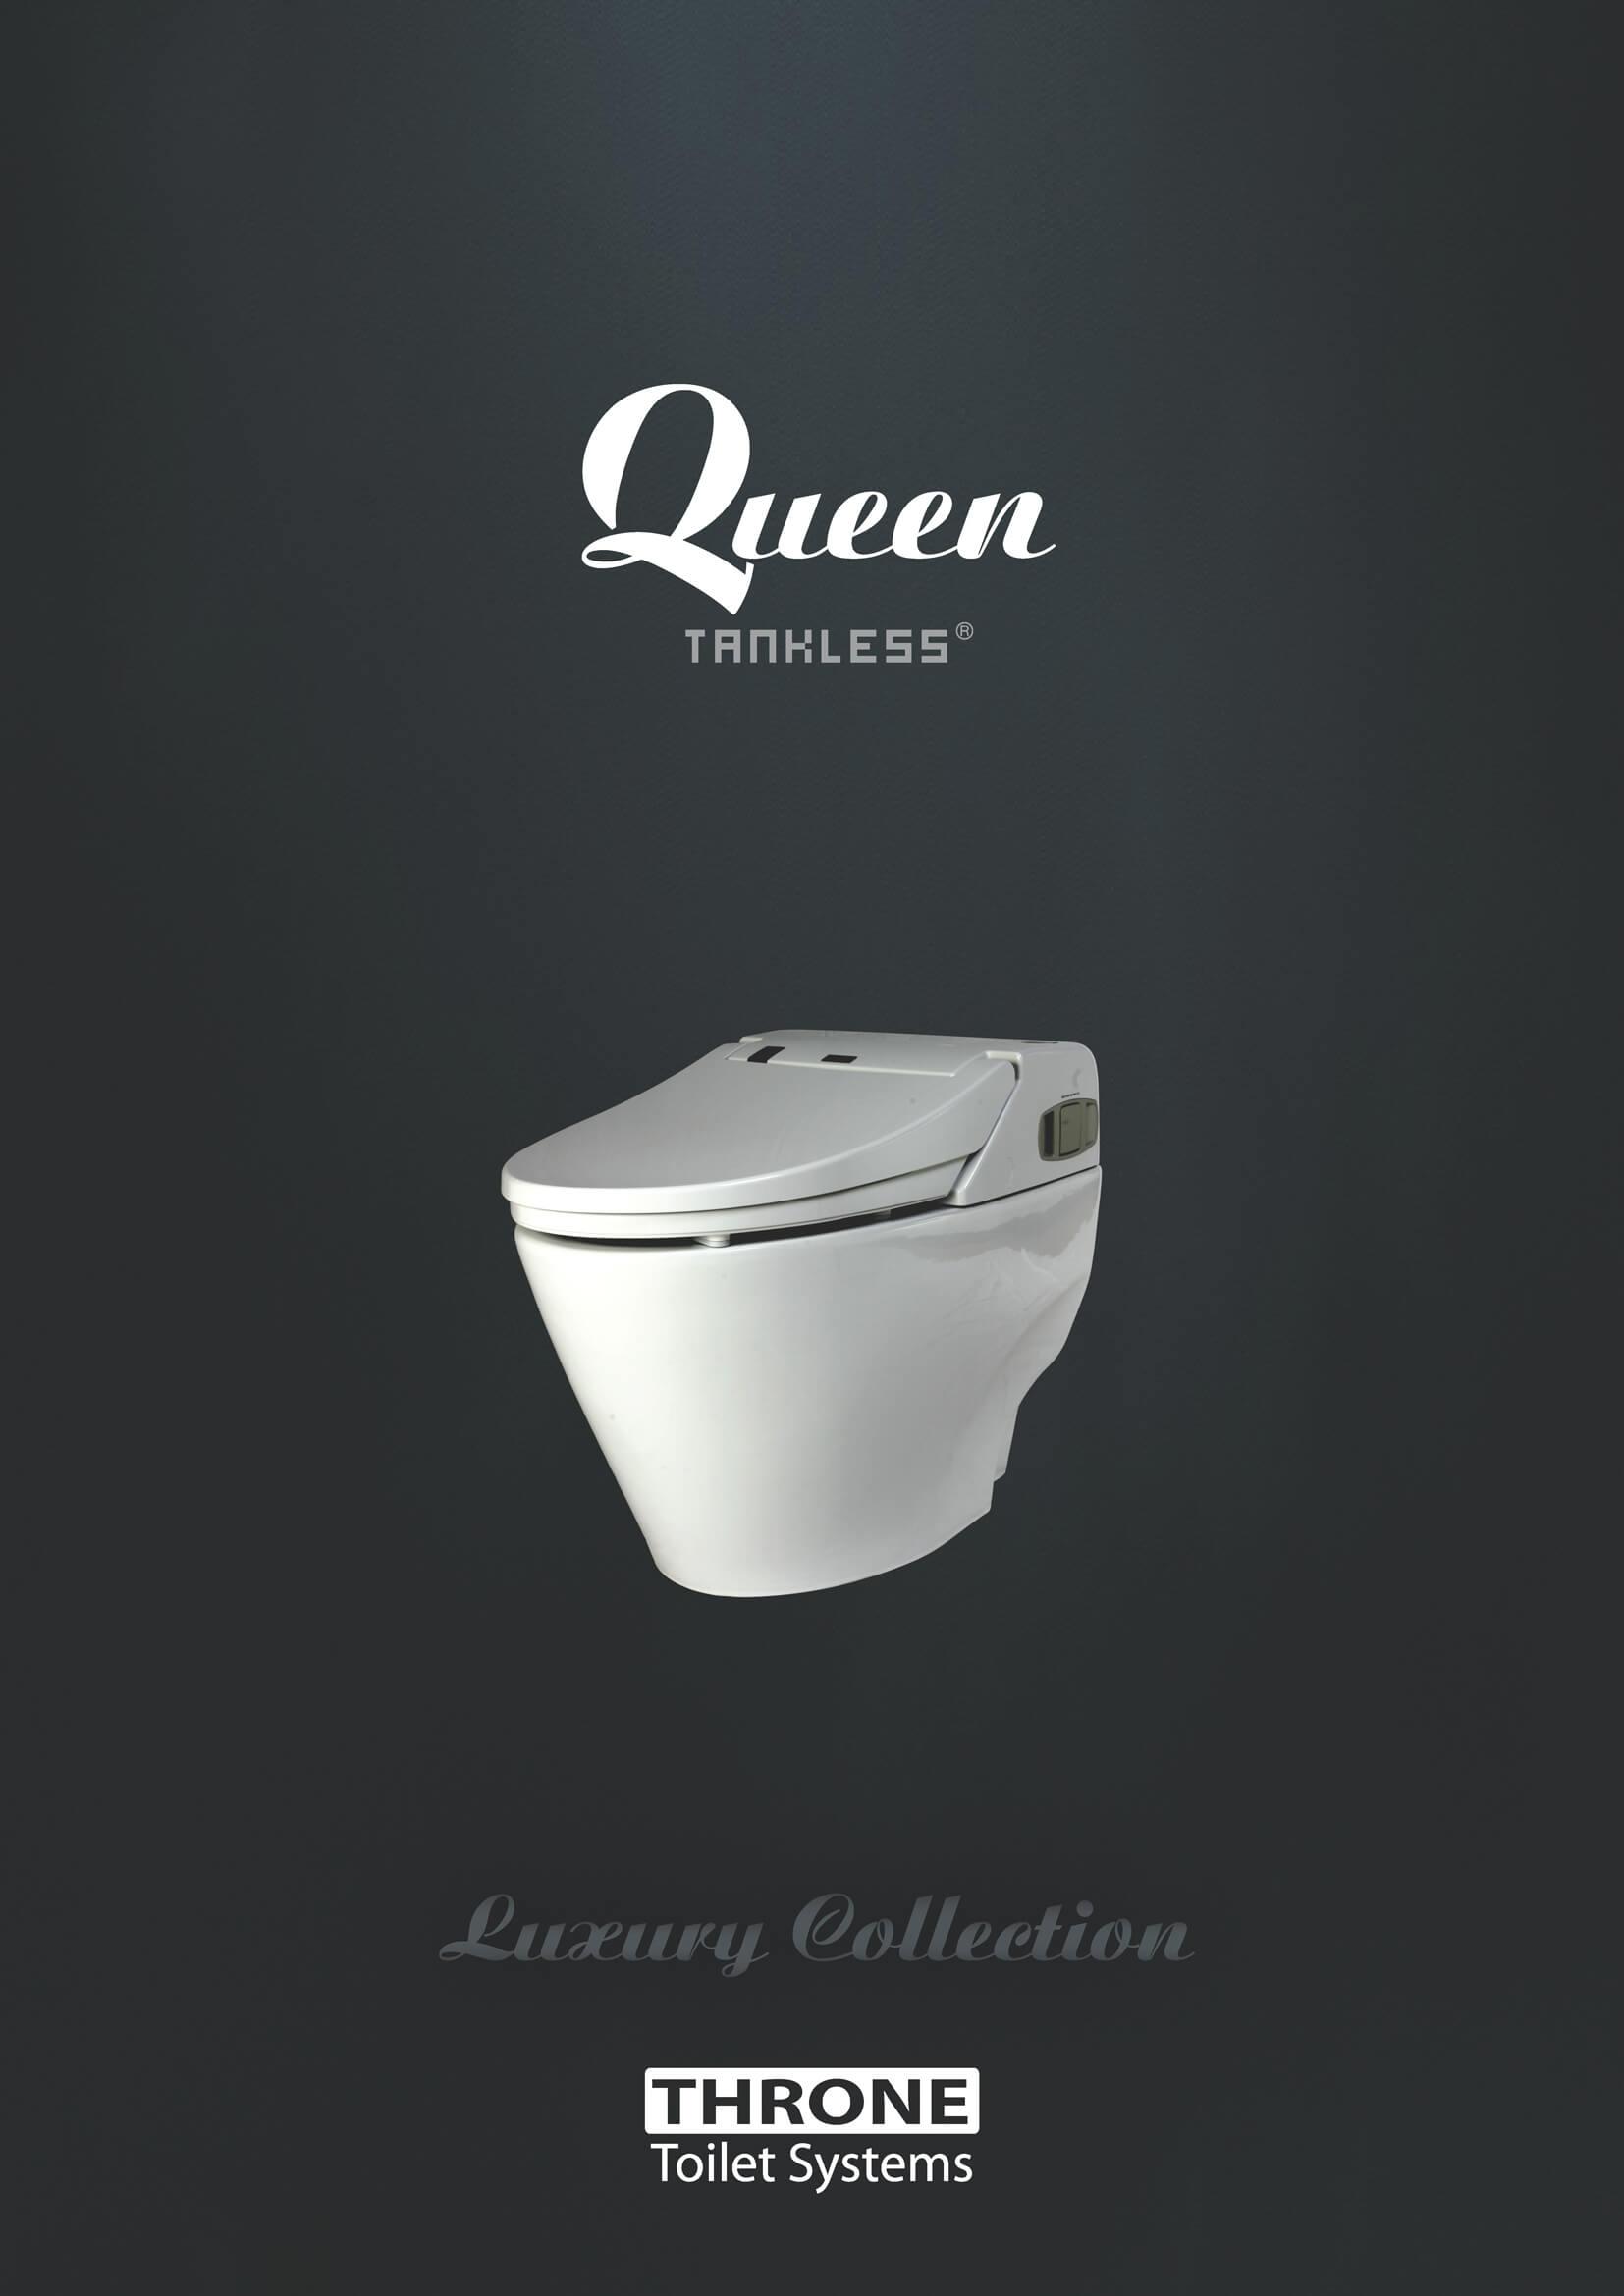 queen-brochure-throne-2016-page-1.jpg